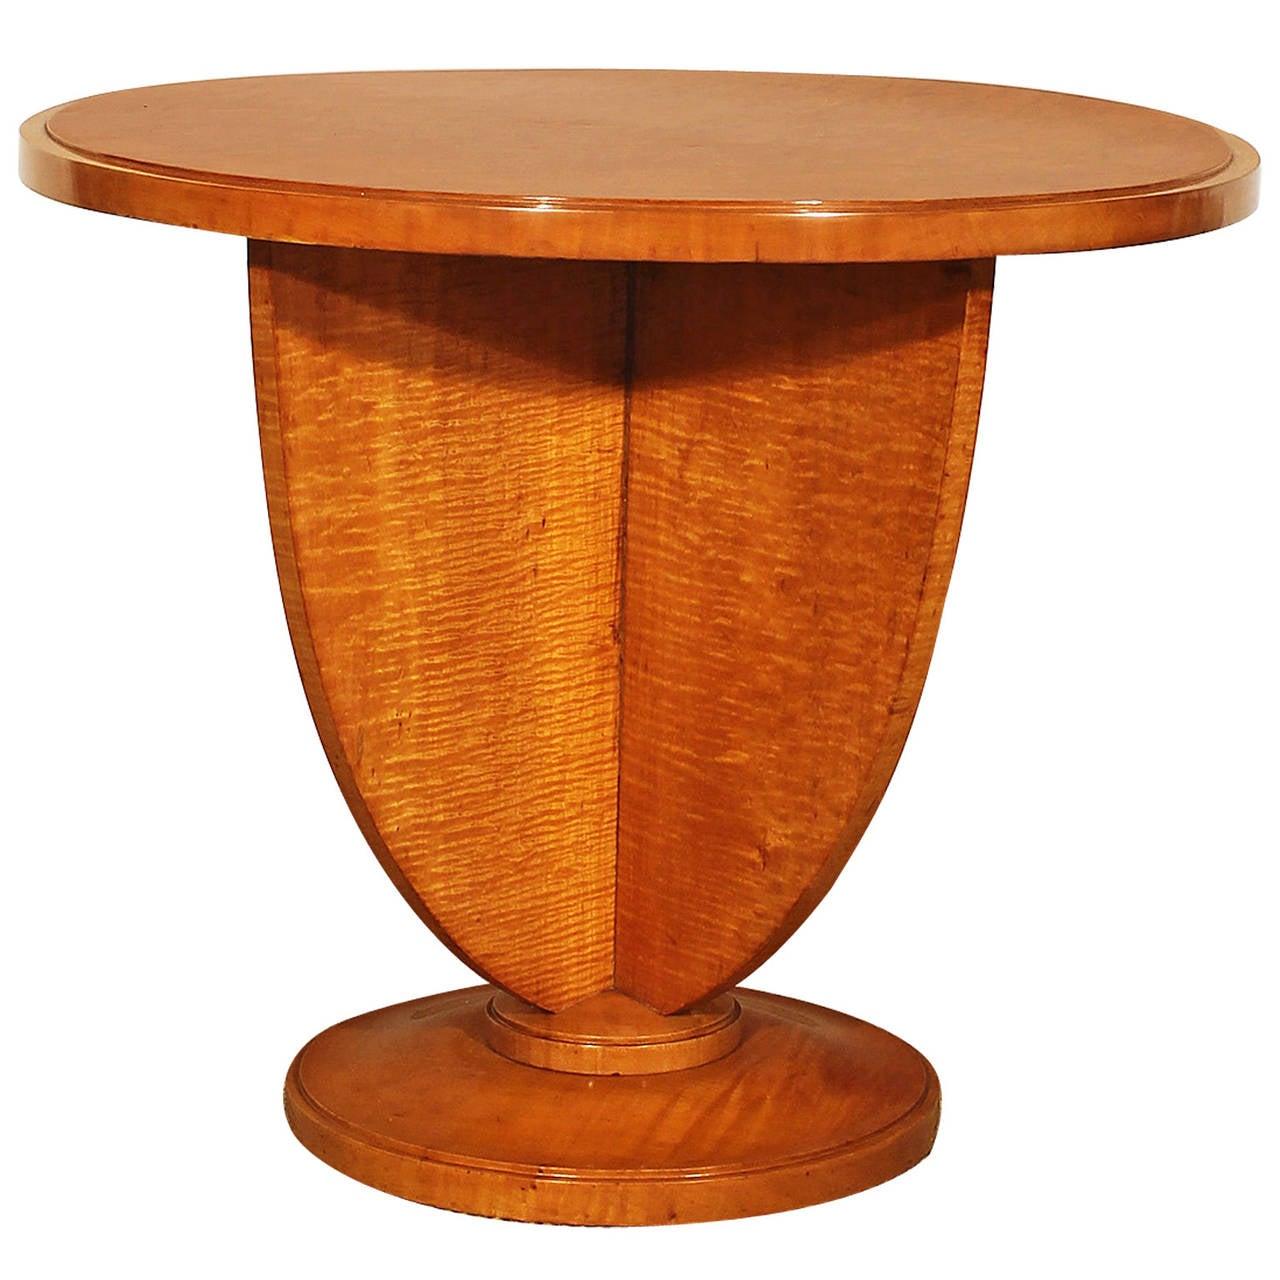 1925 art deco round sidetable birdseye maple veneer for Deco francaise